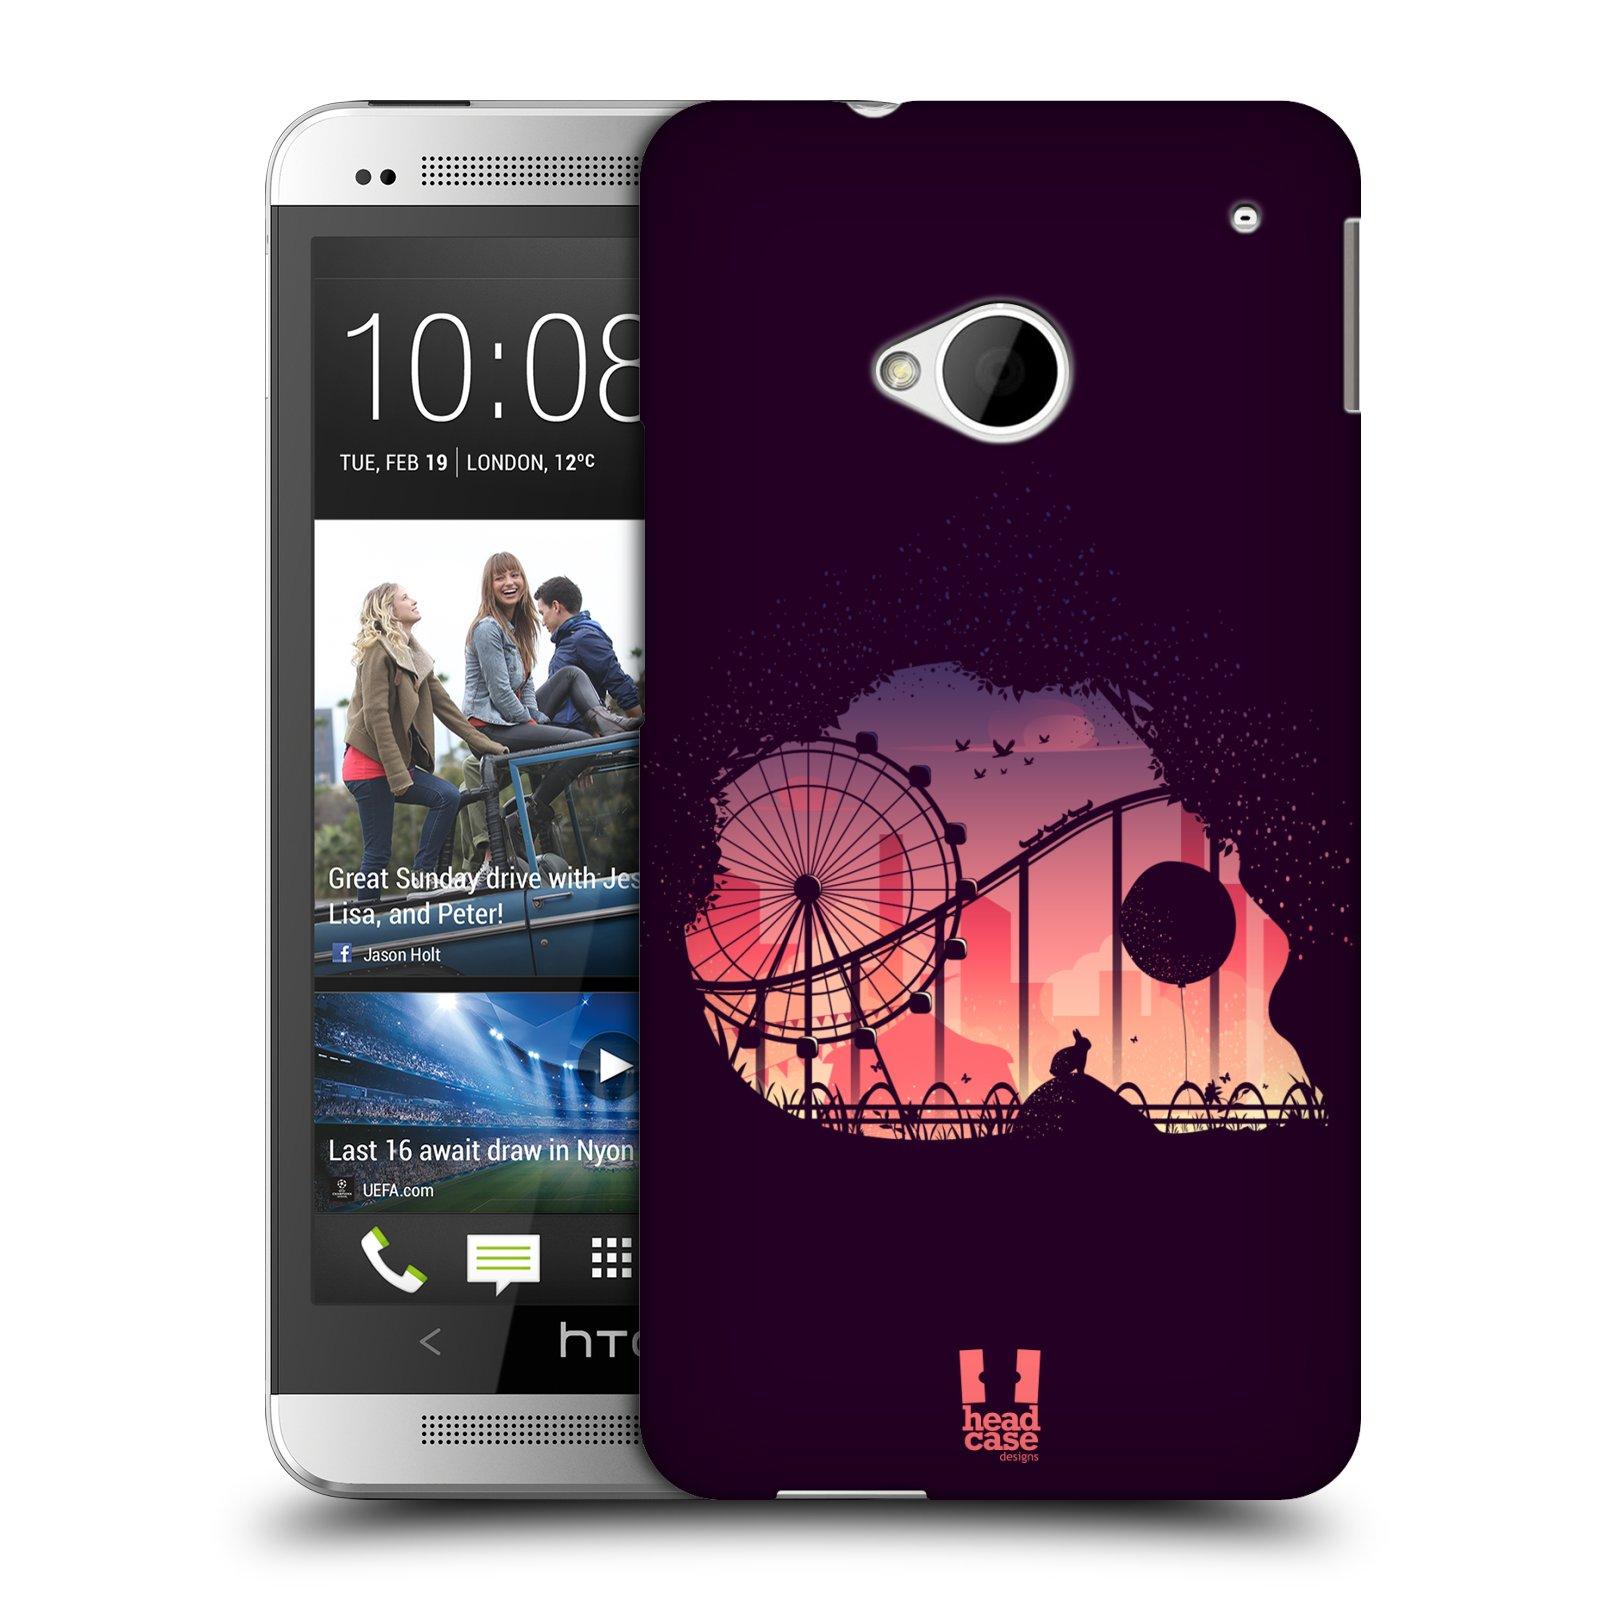 HEAD CASE DESIGNS SKULLSCAPE CASE COVER FOR HTC ONE